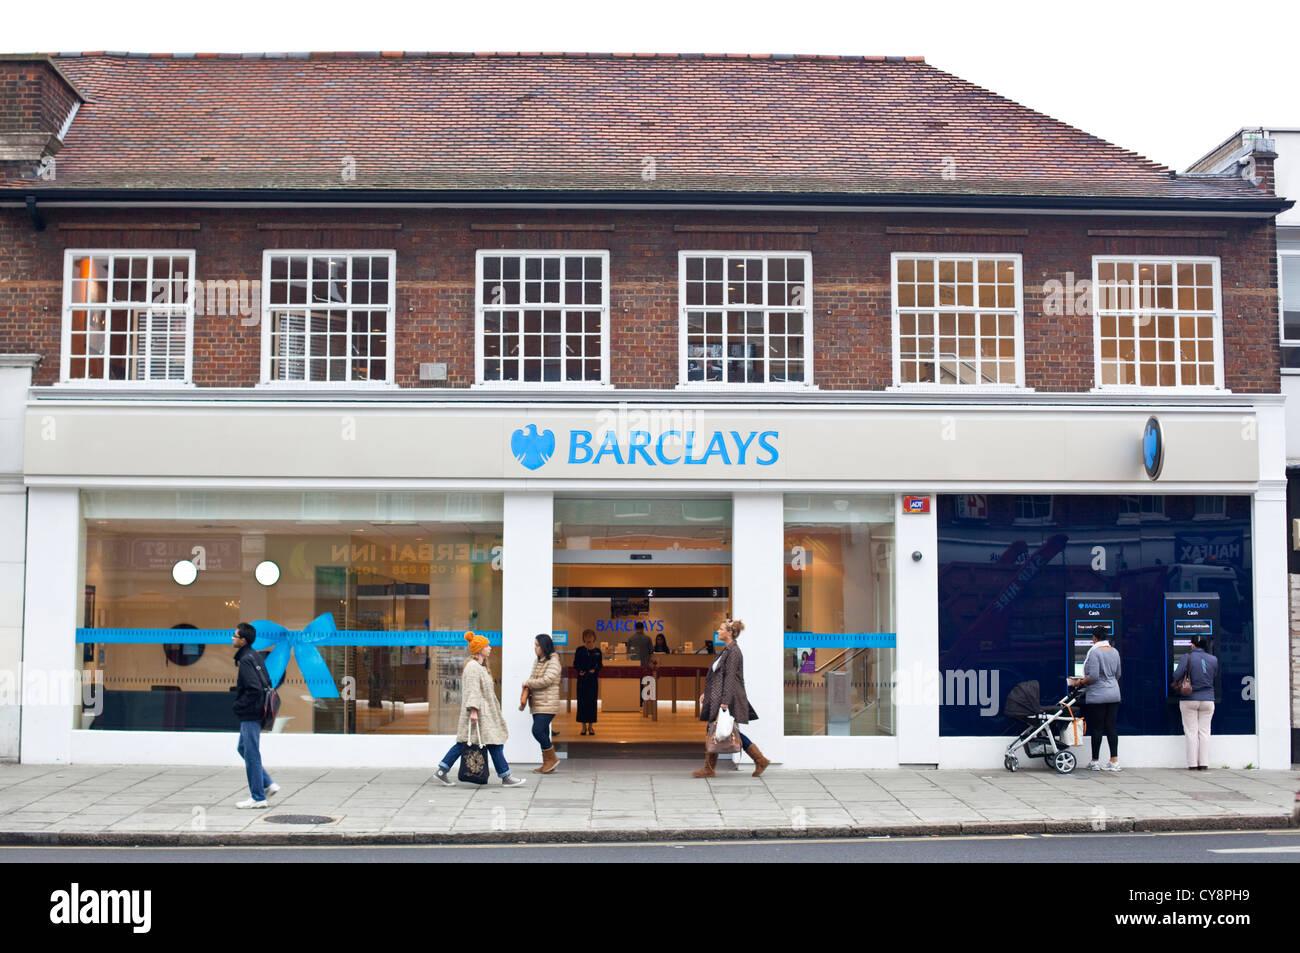 Barclays bank branch, Edgware, England, UK - Stock Image